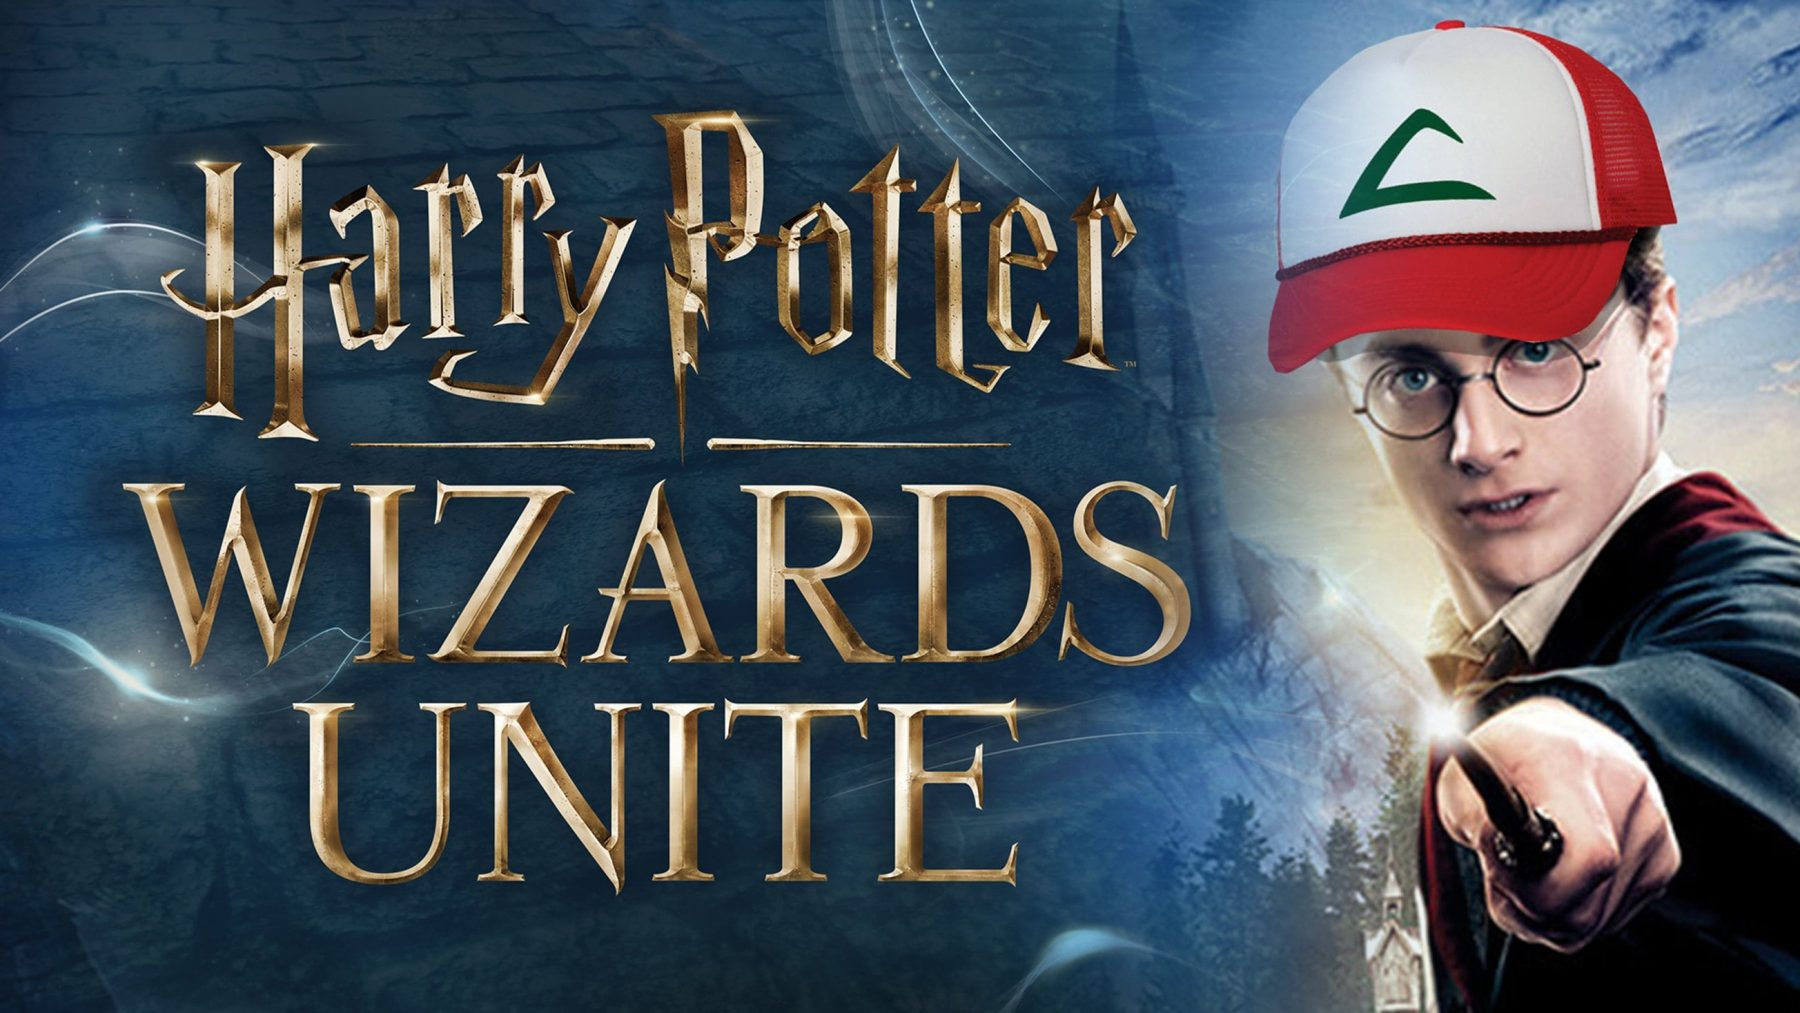 Harry Potter Wizards Unite Wallpaper